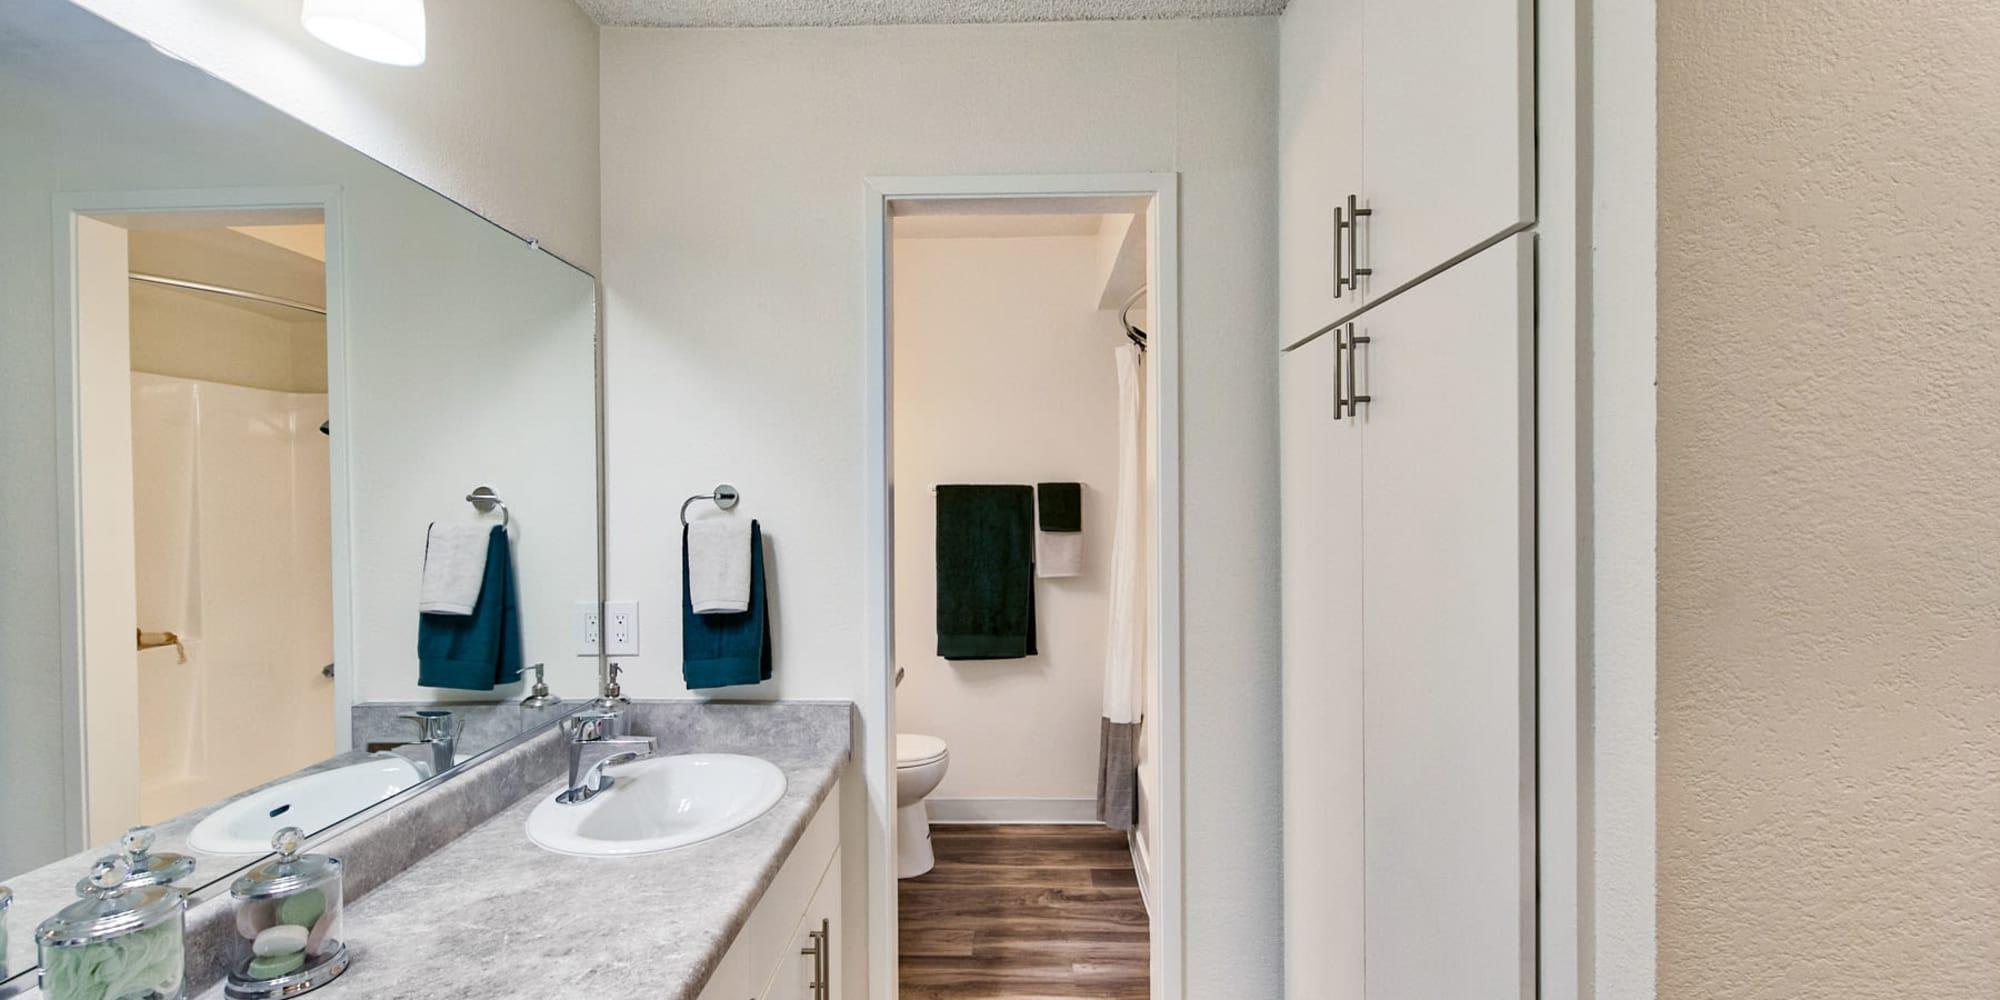 Large vanity mirror and a granite countertop in a model apartment's bathroom at Mediterranean Village Apartments in Costa Mesa, California